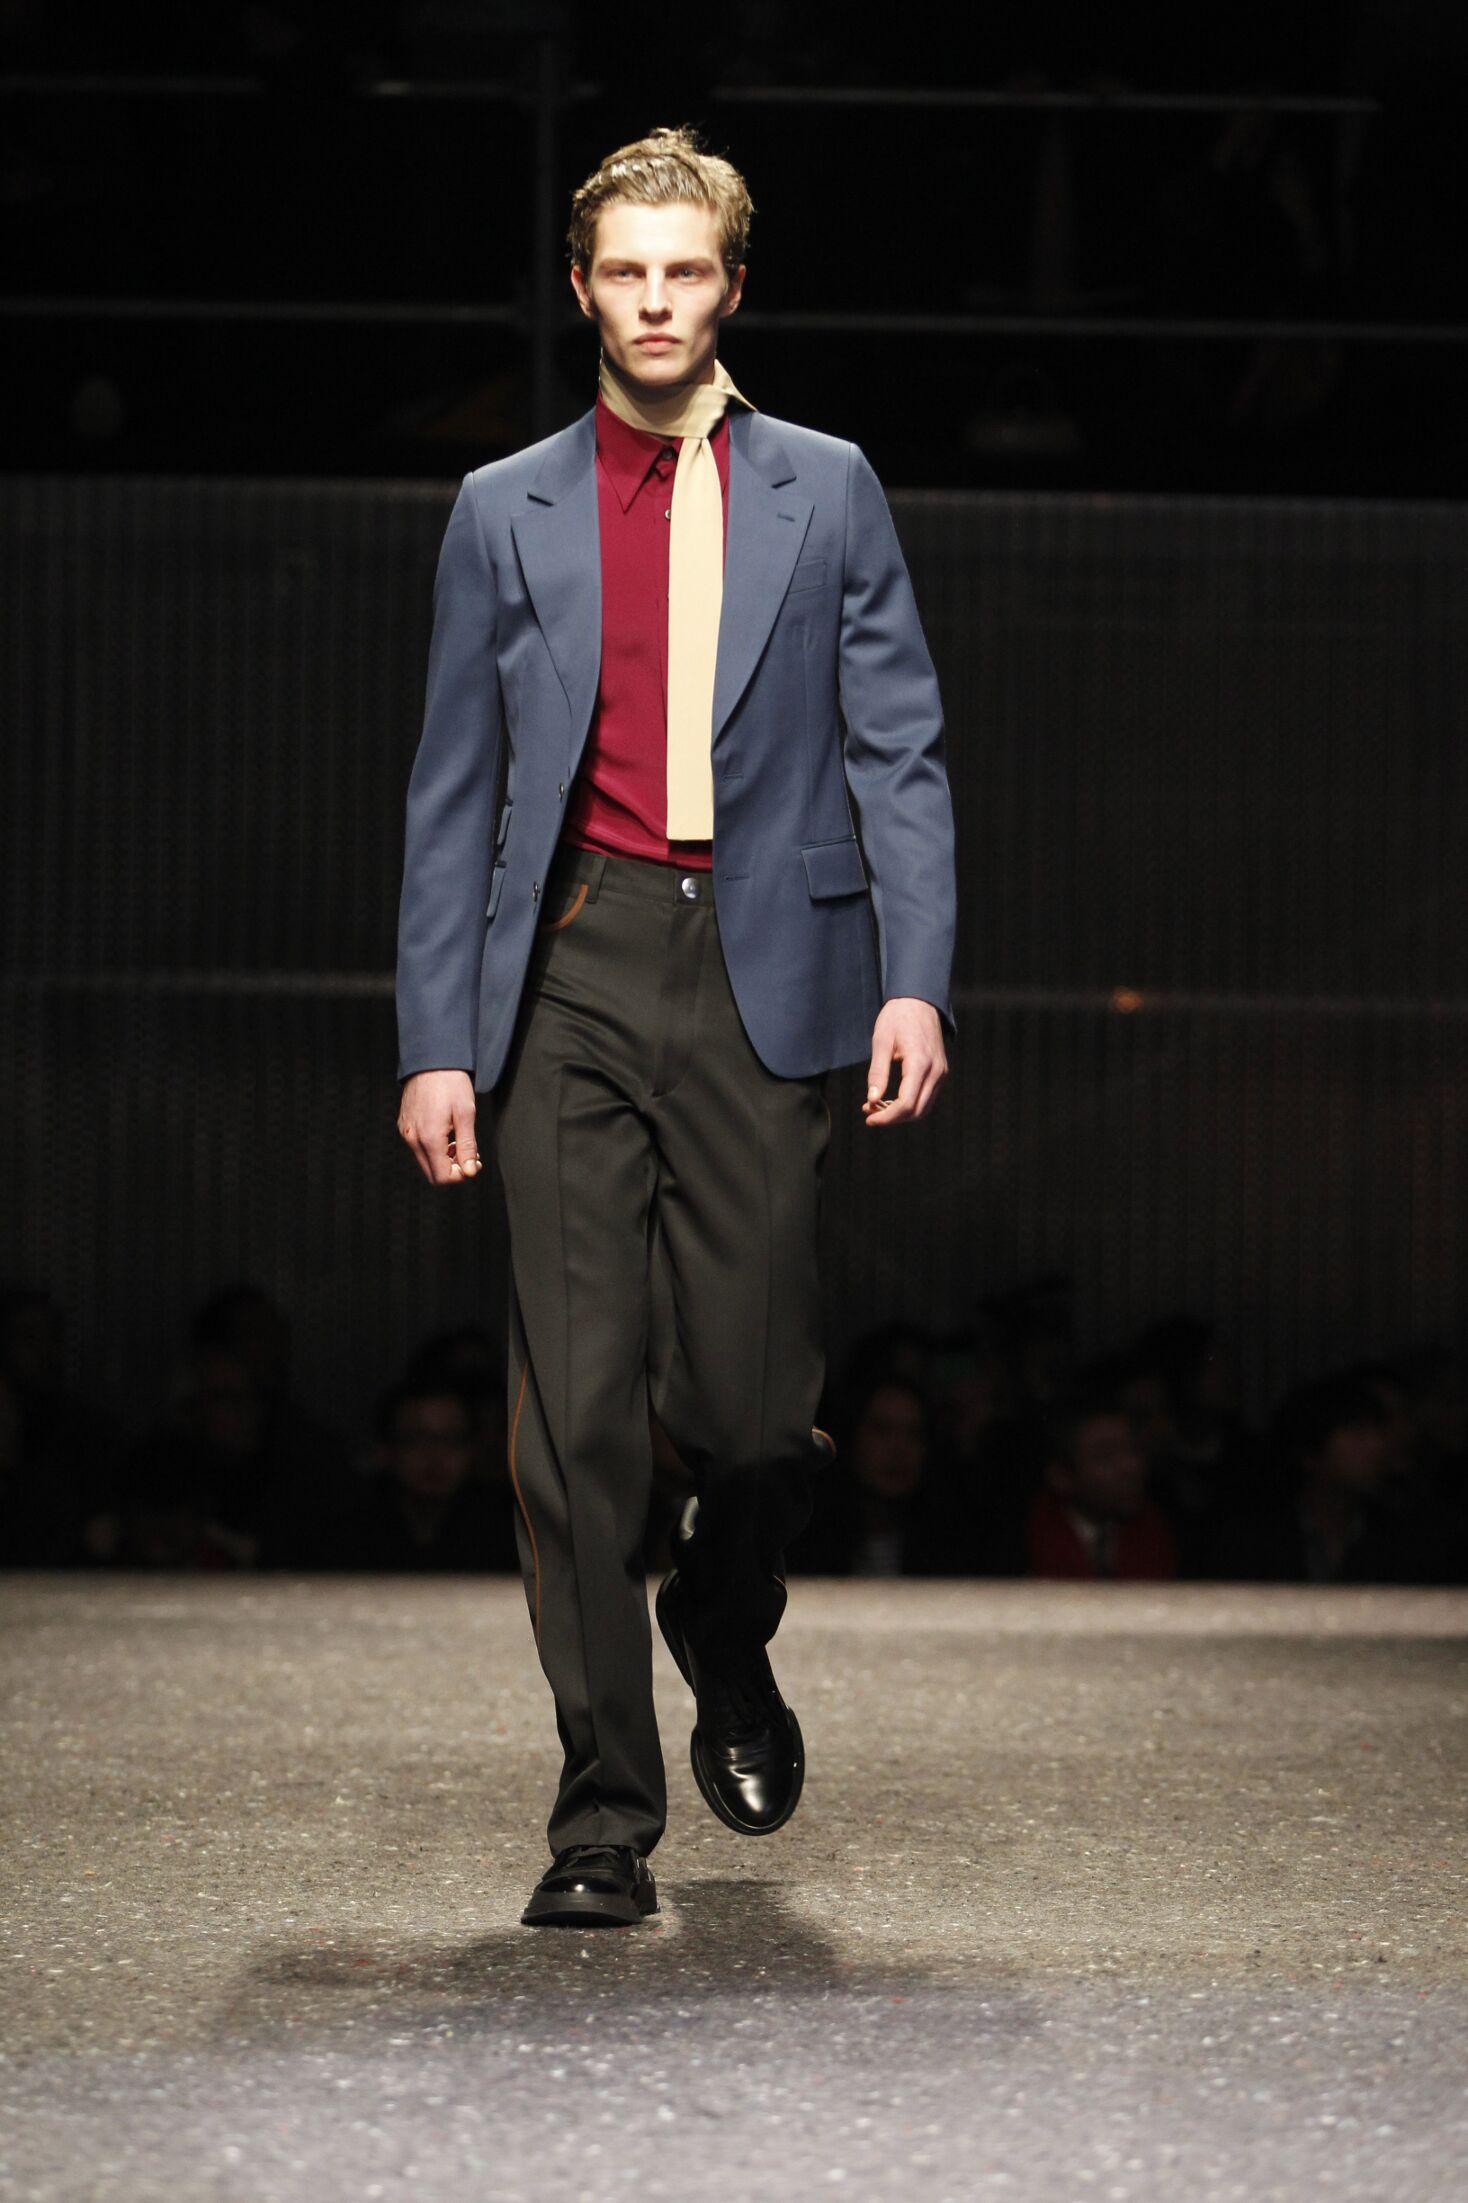 Fashion Winter Trends 2014 2015 Prada